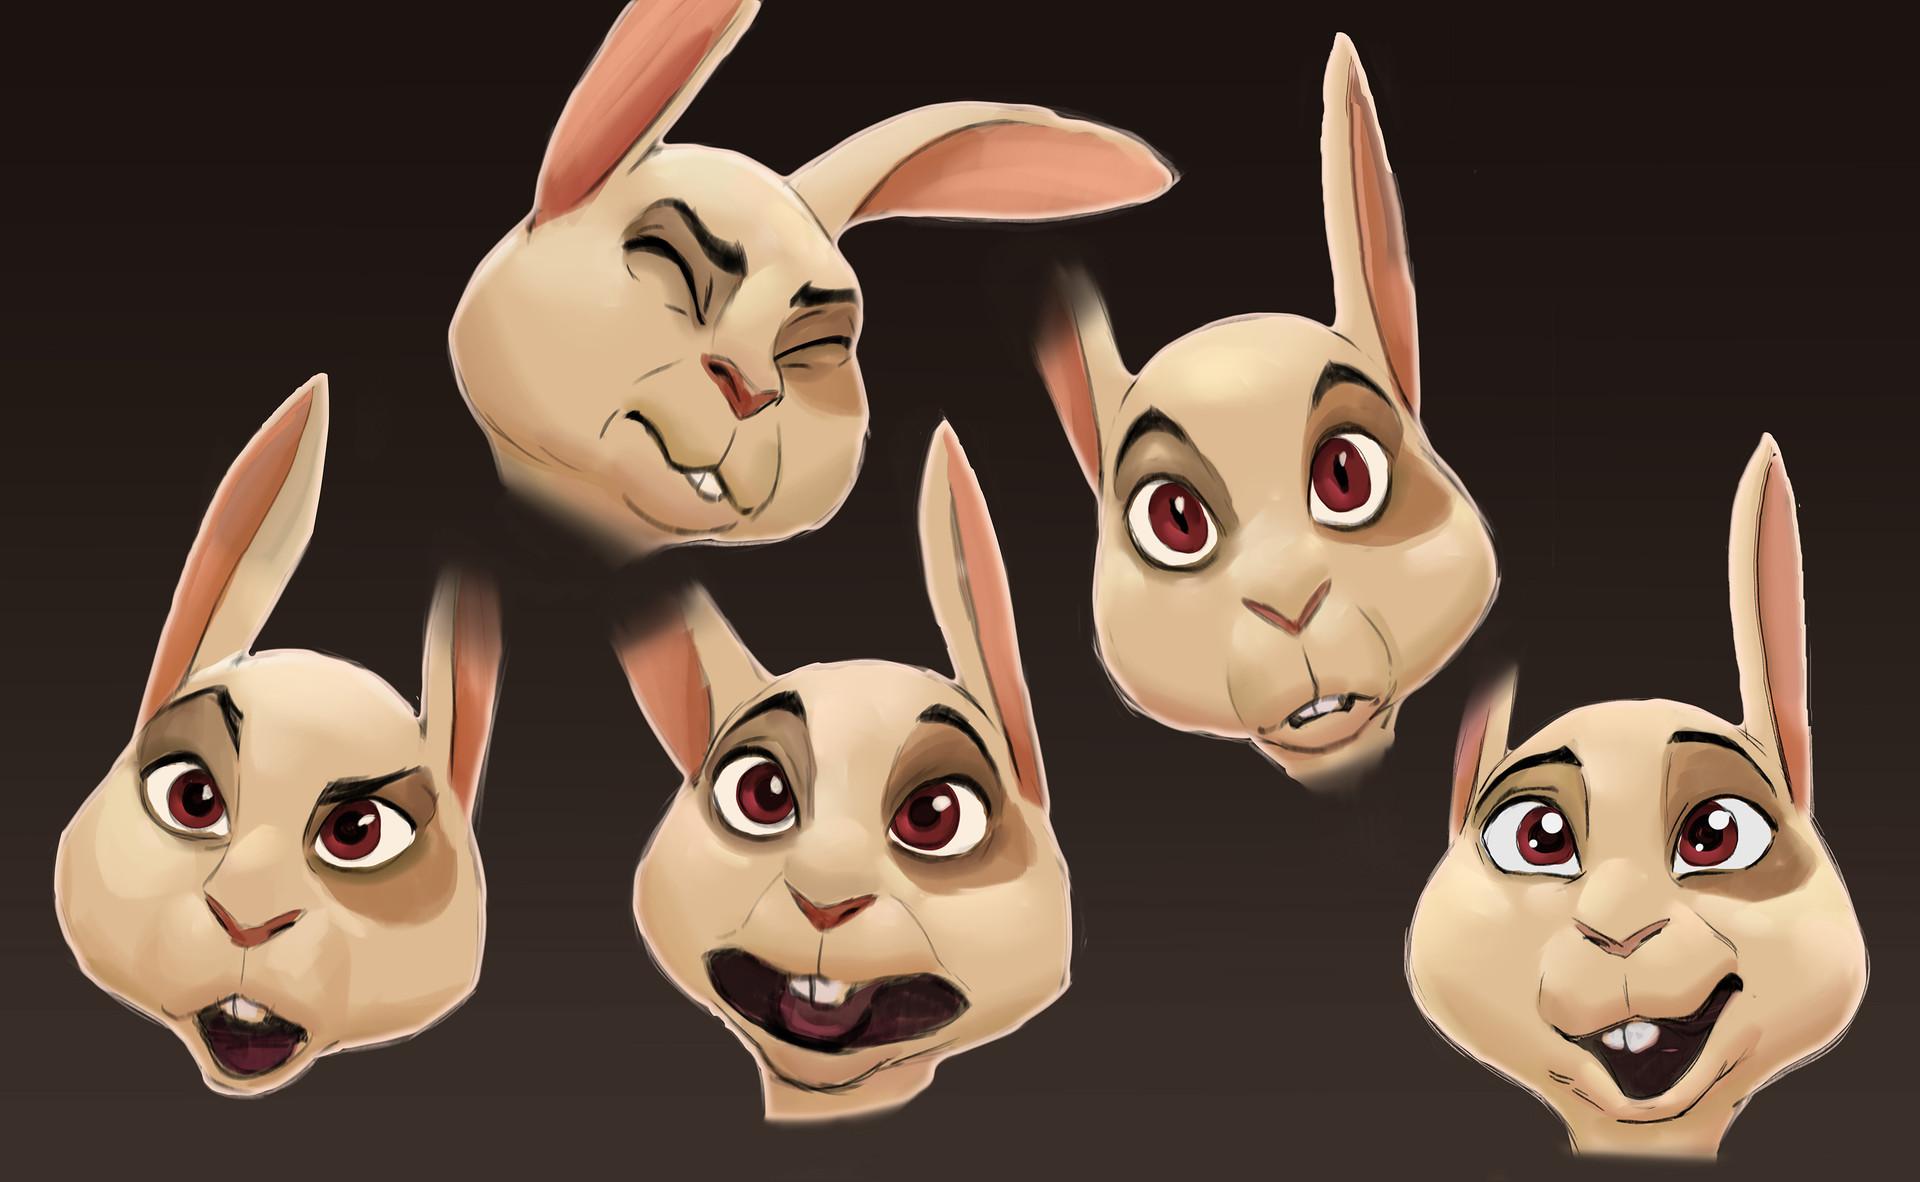 Loic liok bramoulle smks bunny 001 facial